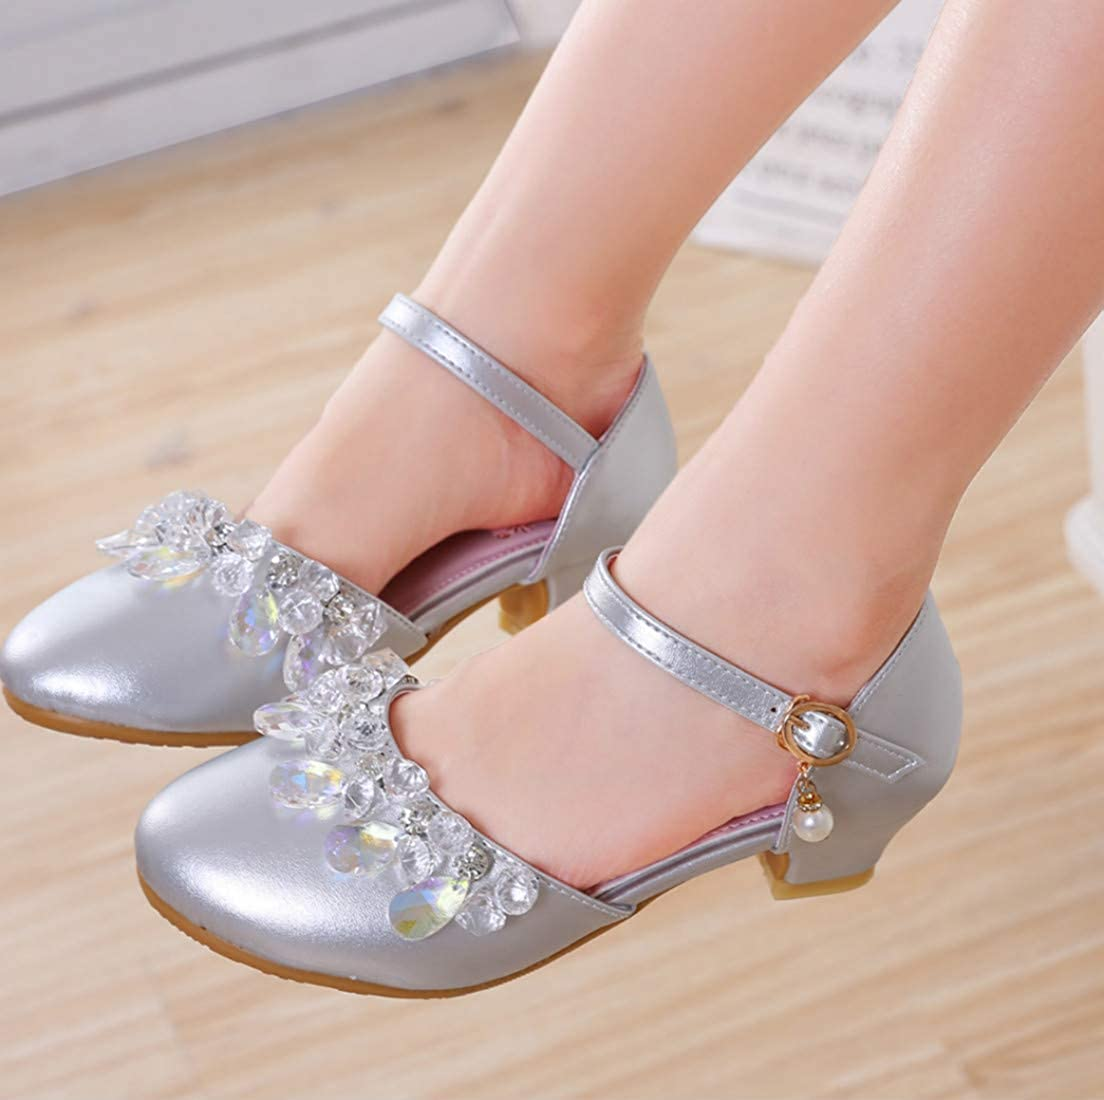 Hook-and-Loop Low Top Toddler//Little Kid VECJUNIA Girls Mary Jane Flats Shoes Rhinestones Flowers Party Ballet